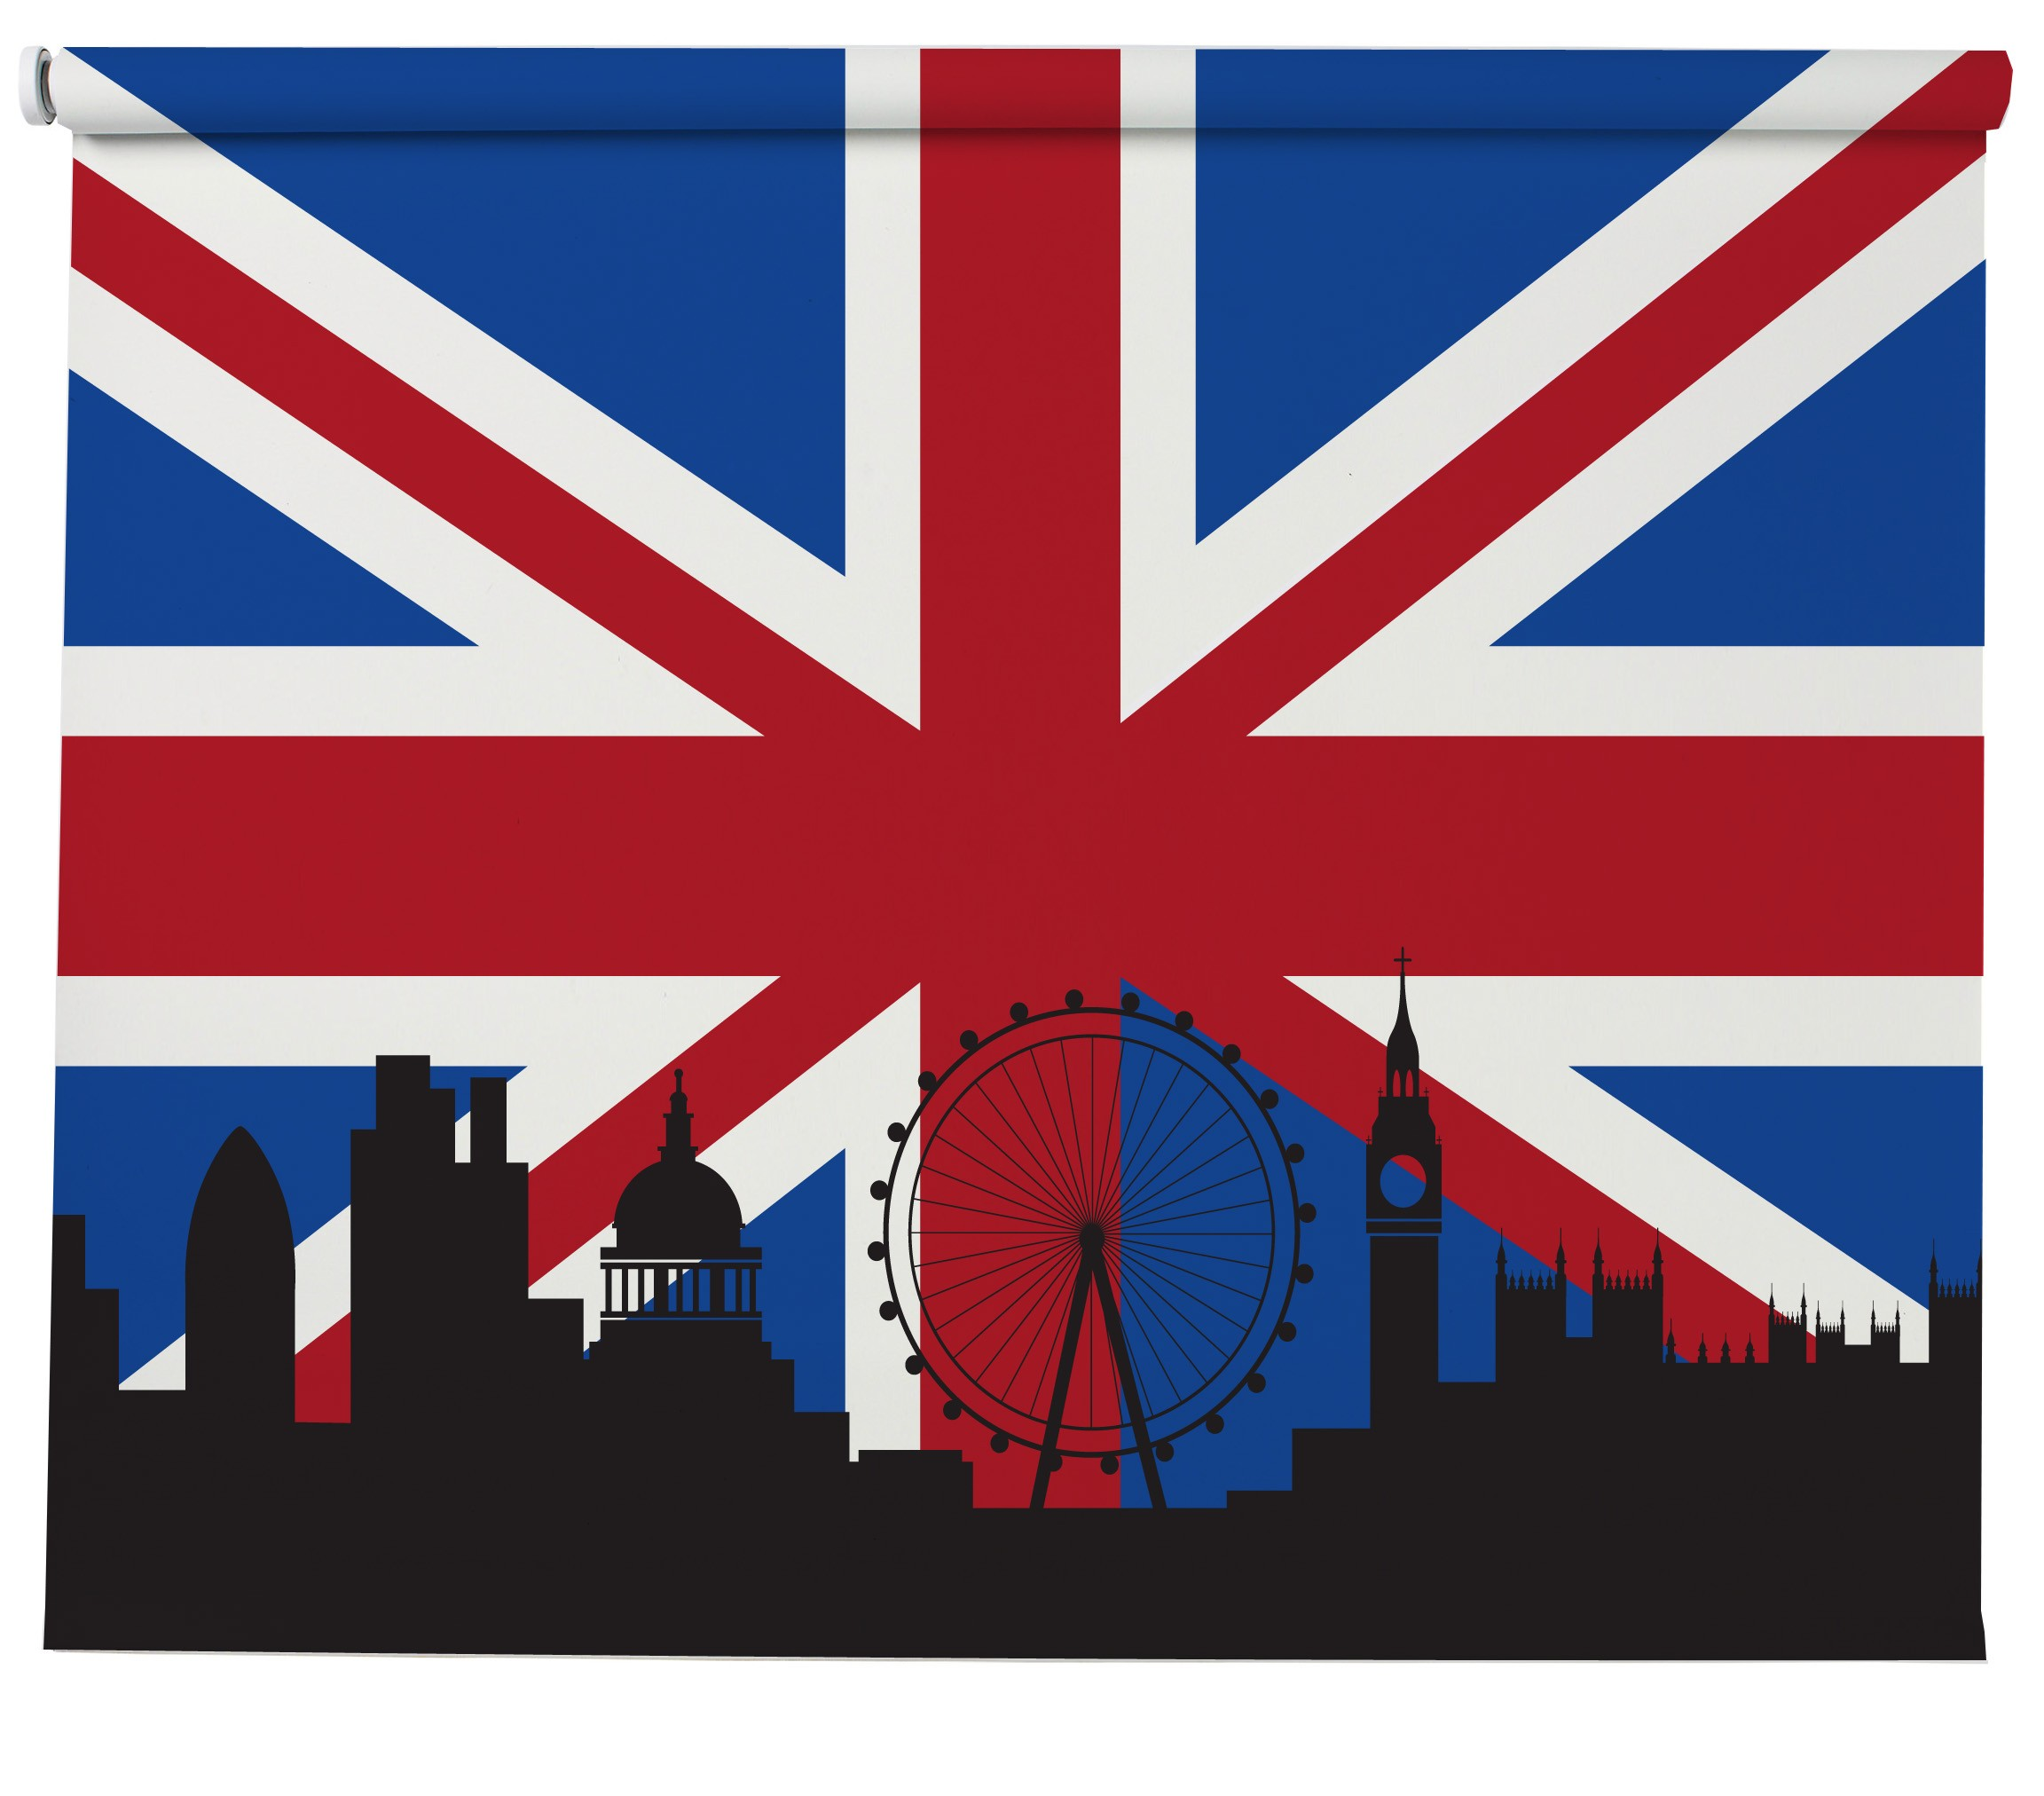 Schoudertas Union Jack : Union jack london skyline blind picture printed blinds